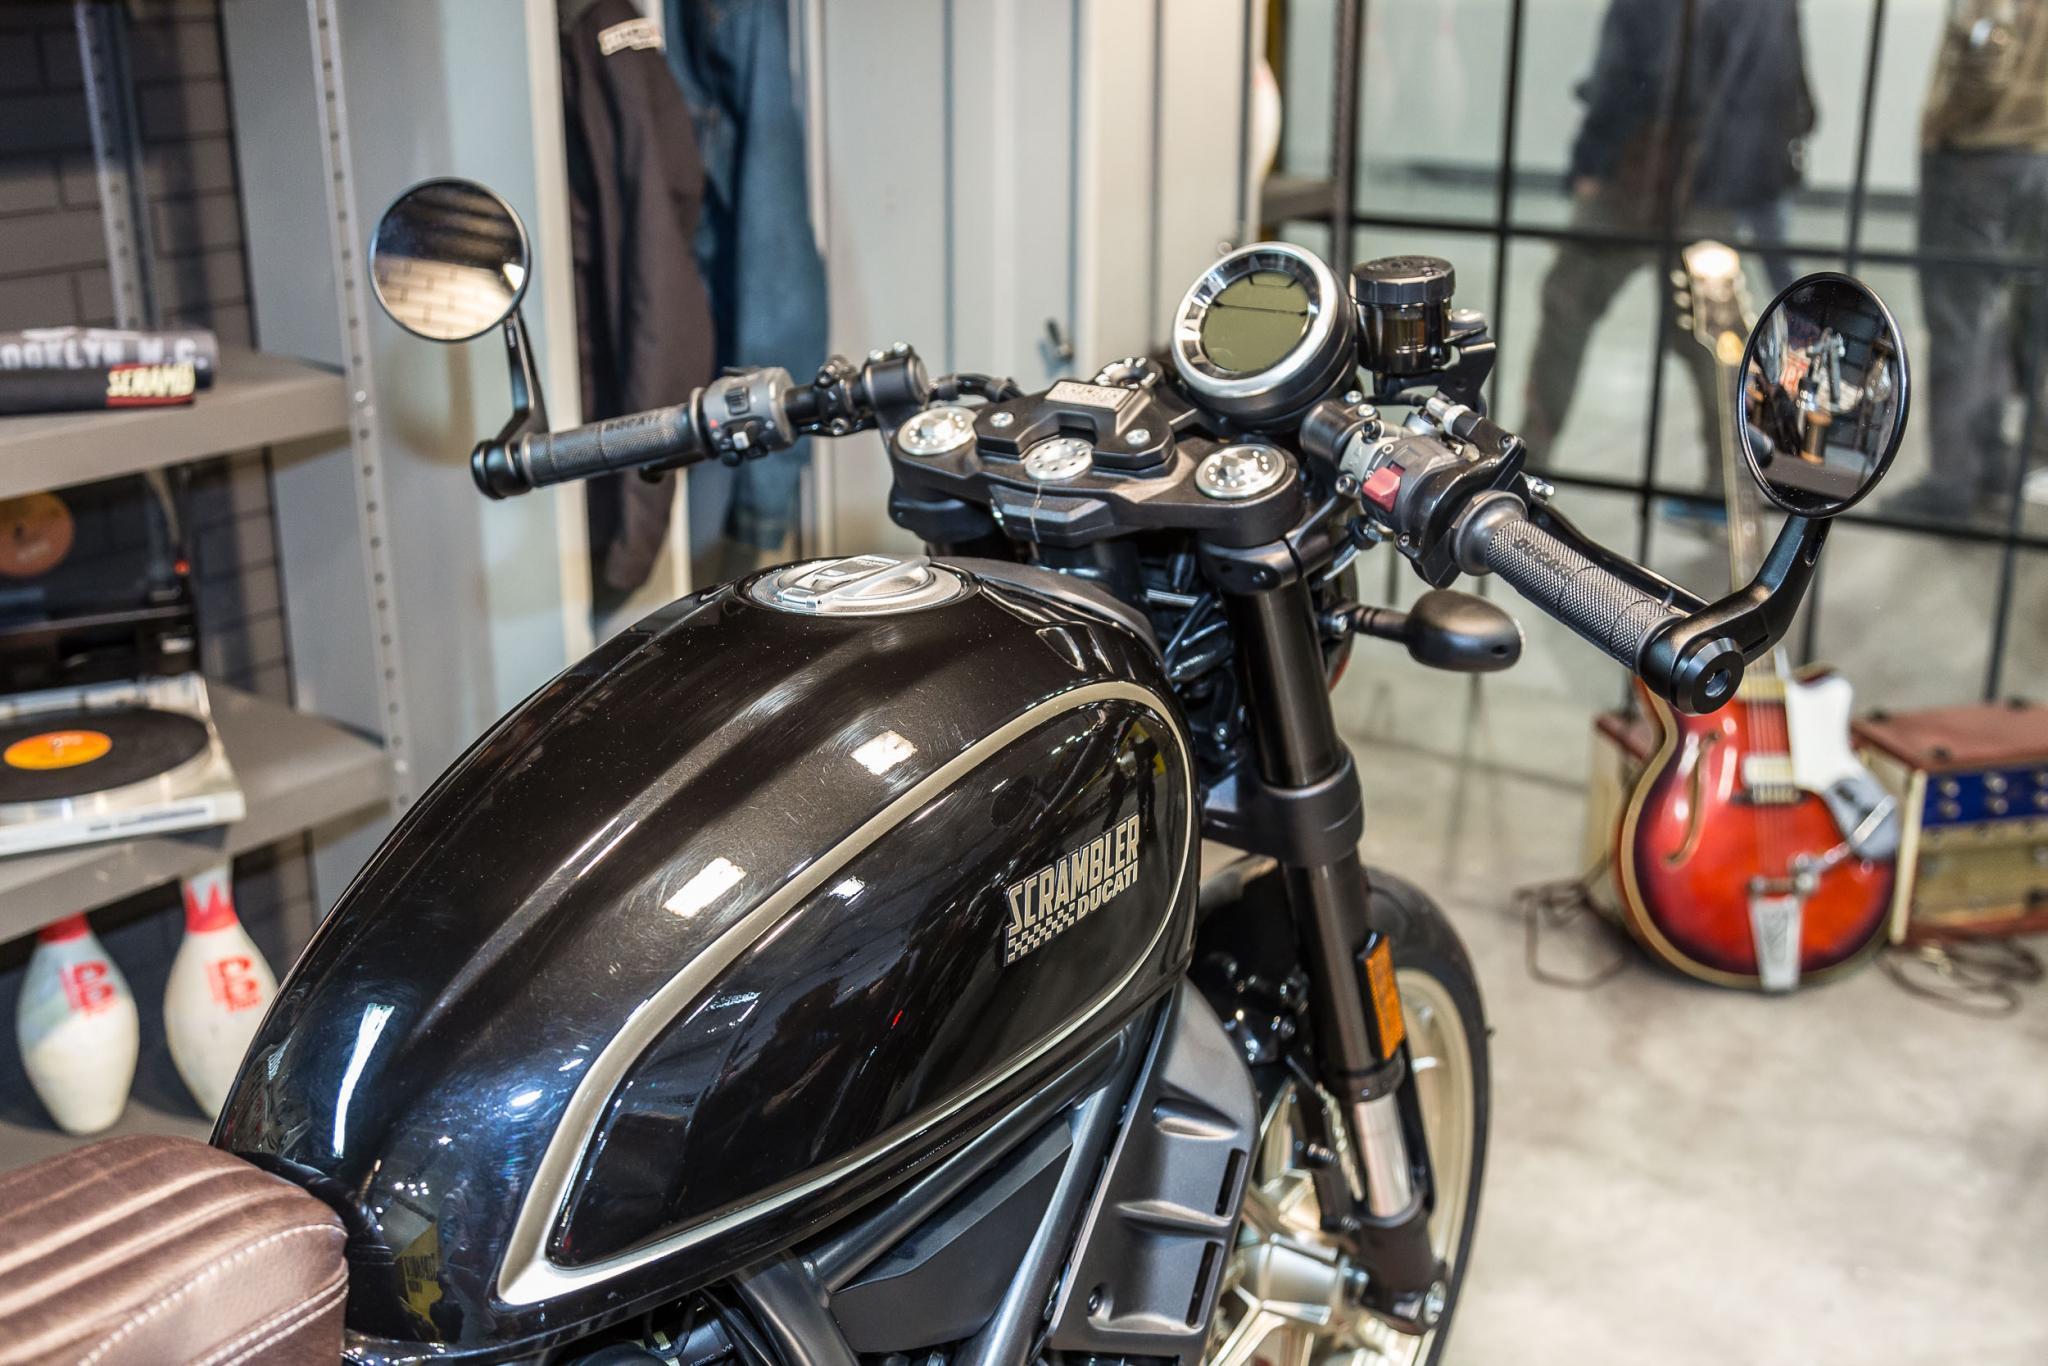 ducati scrambler cafe racer 2017 motorrad fotos motorrad. Black Bedroom Furniture Sets. Home Design Ideas